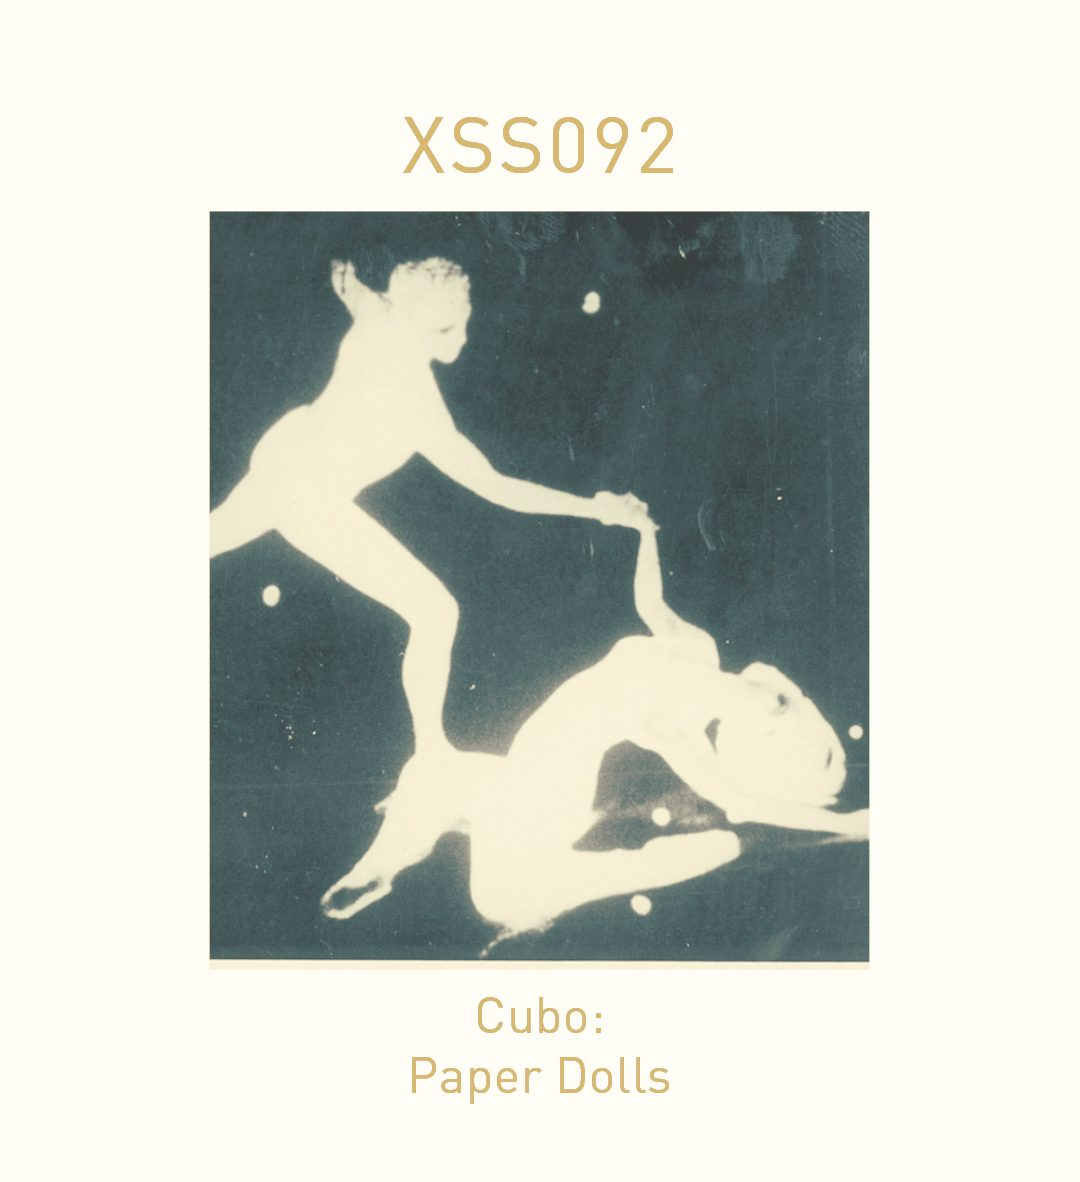 XSS092 | Cubo | Paper Dolls